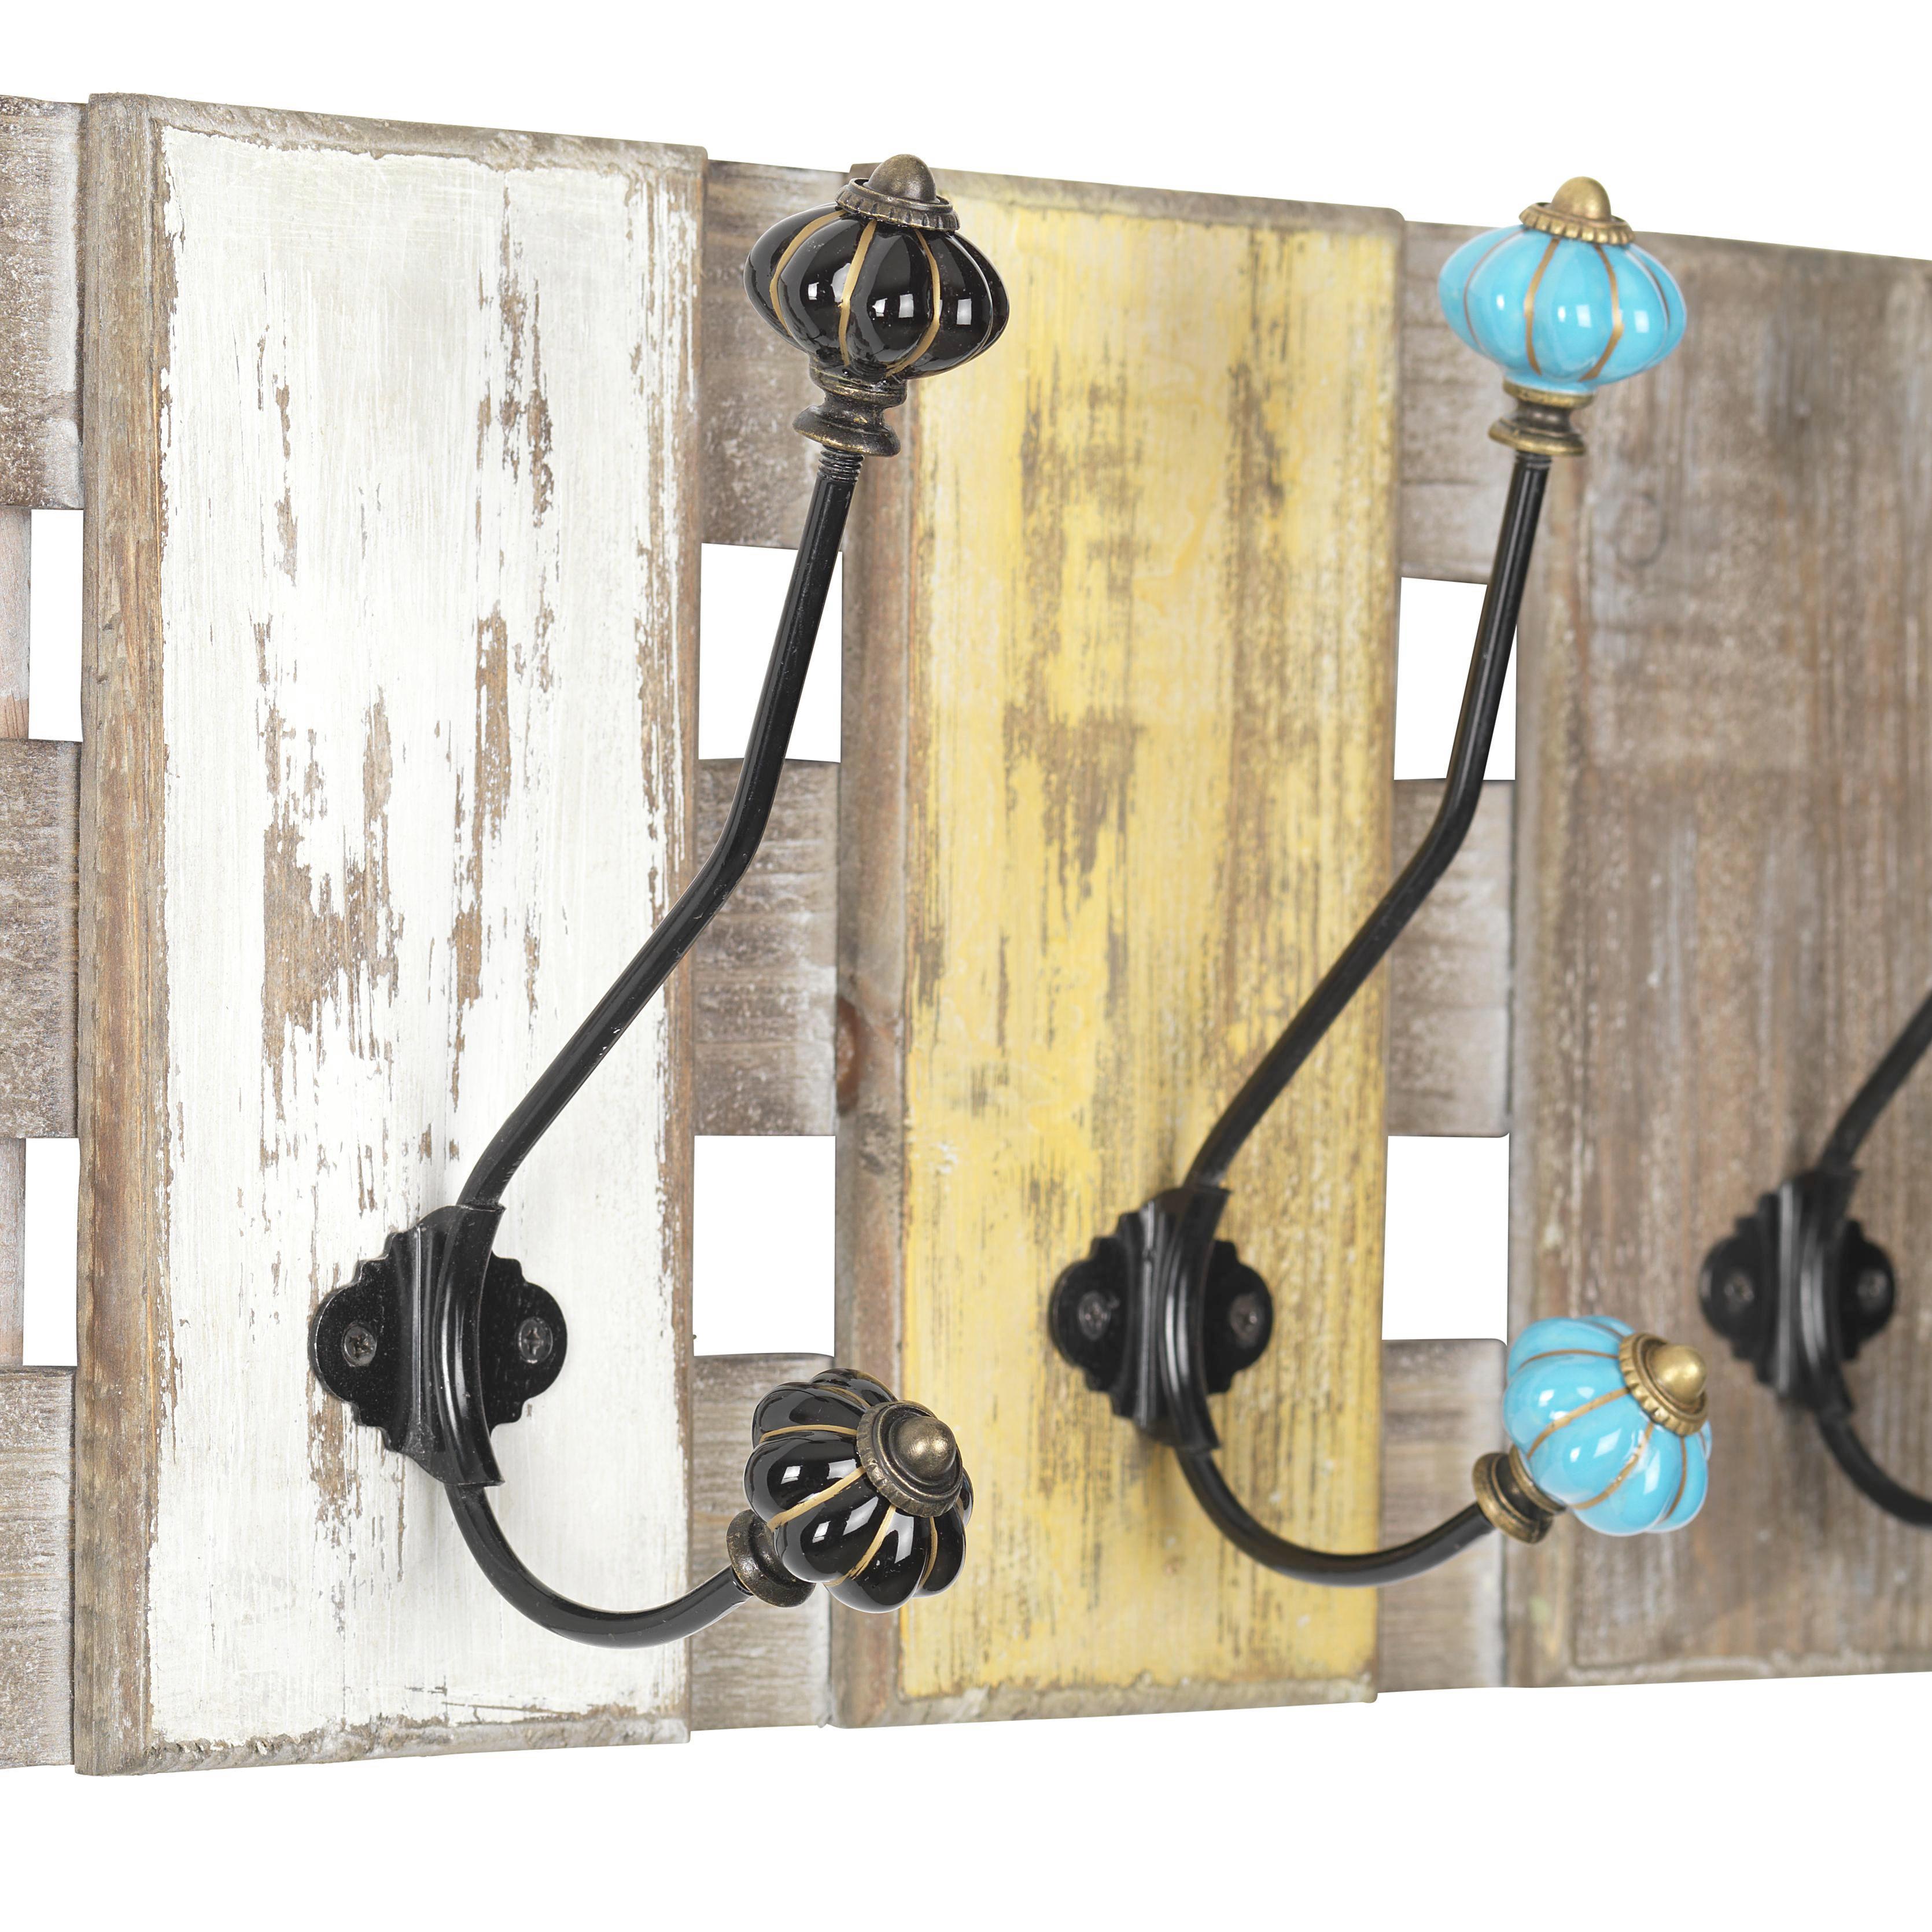 Wandgarderobe Anna - Multicolor, Holz/Keramik (59/21/11cm) - PREMIUM LIVING